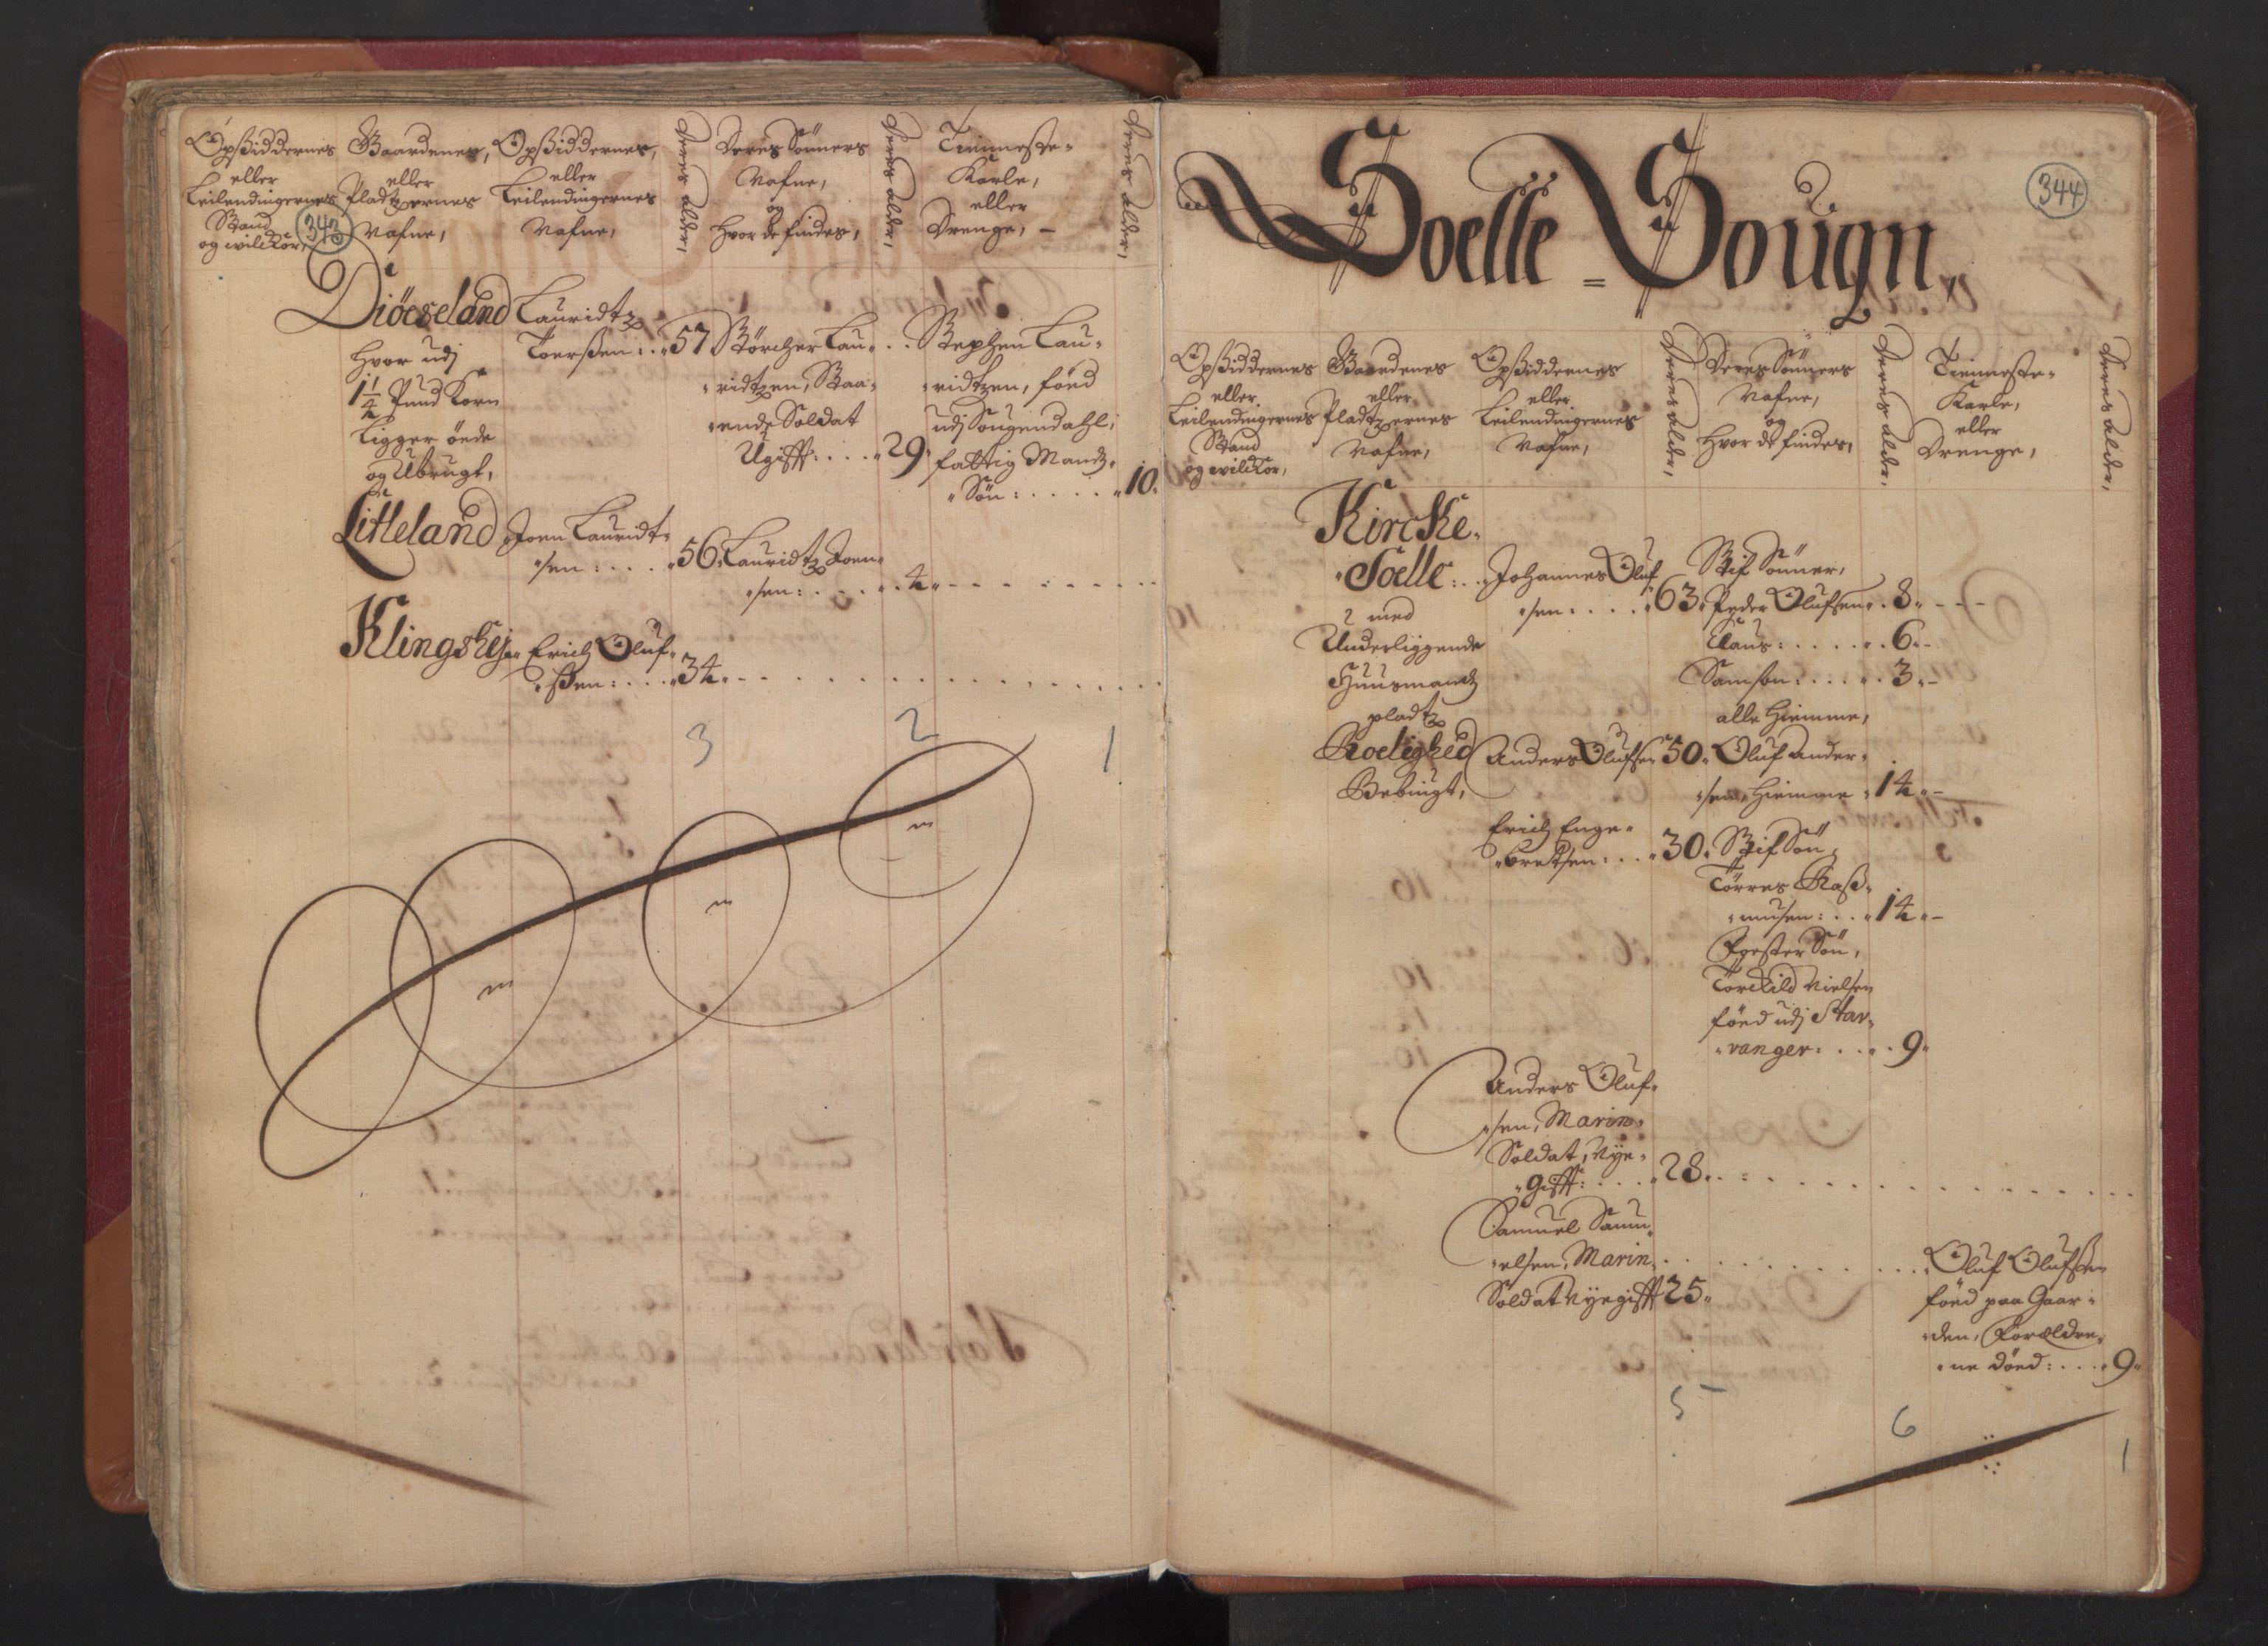 RA, Manntallet 1701, nr. 4: Jæren og Dalane fogderi, 1701, s. 343-344